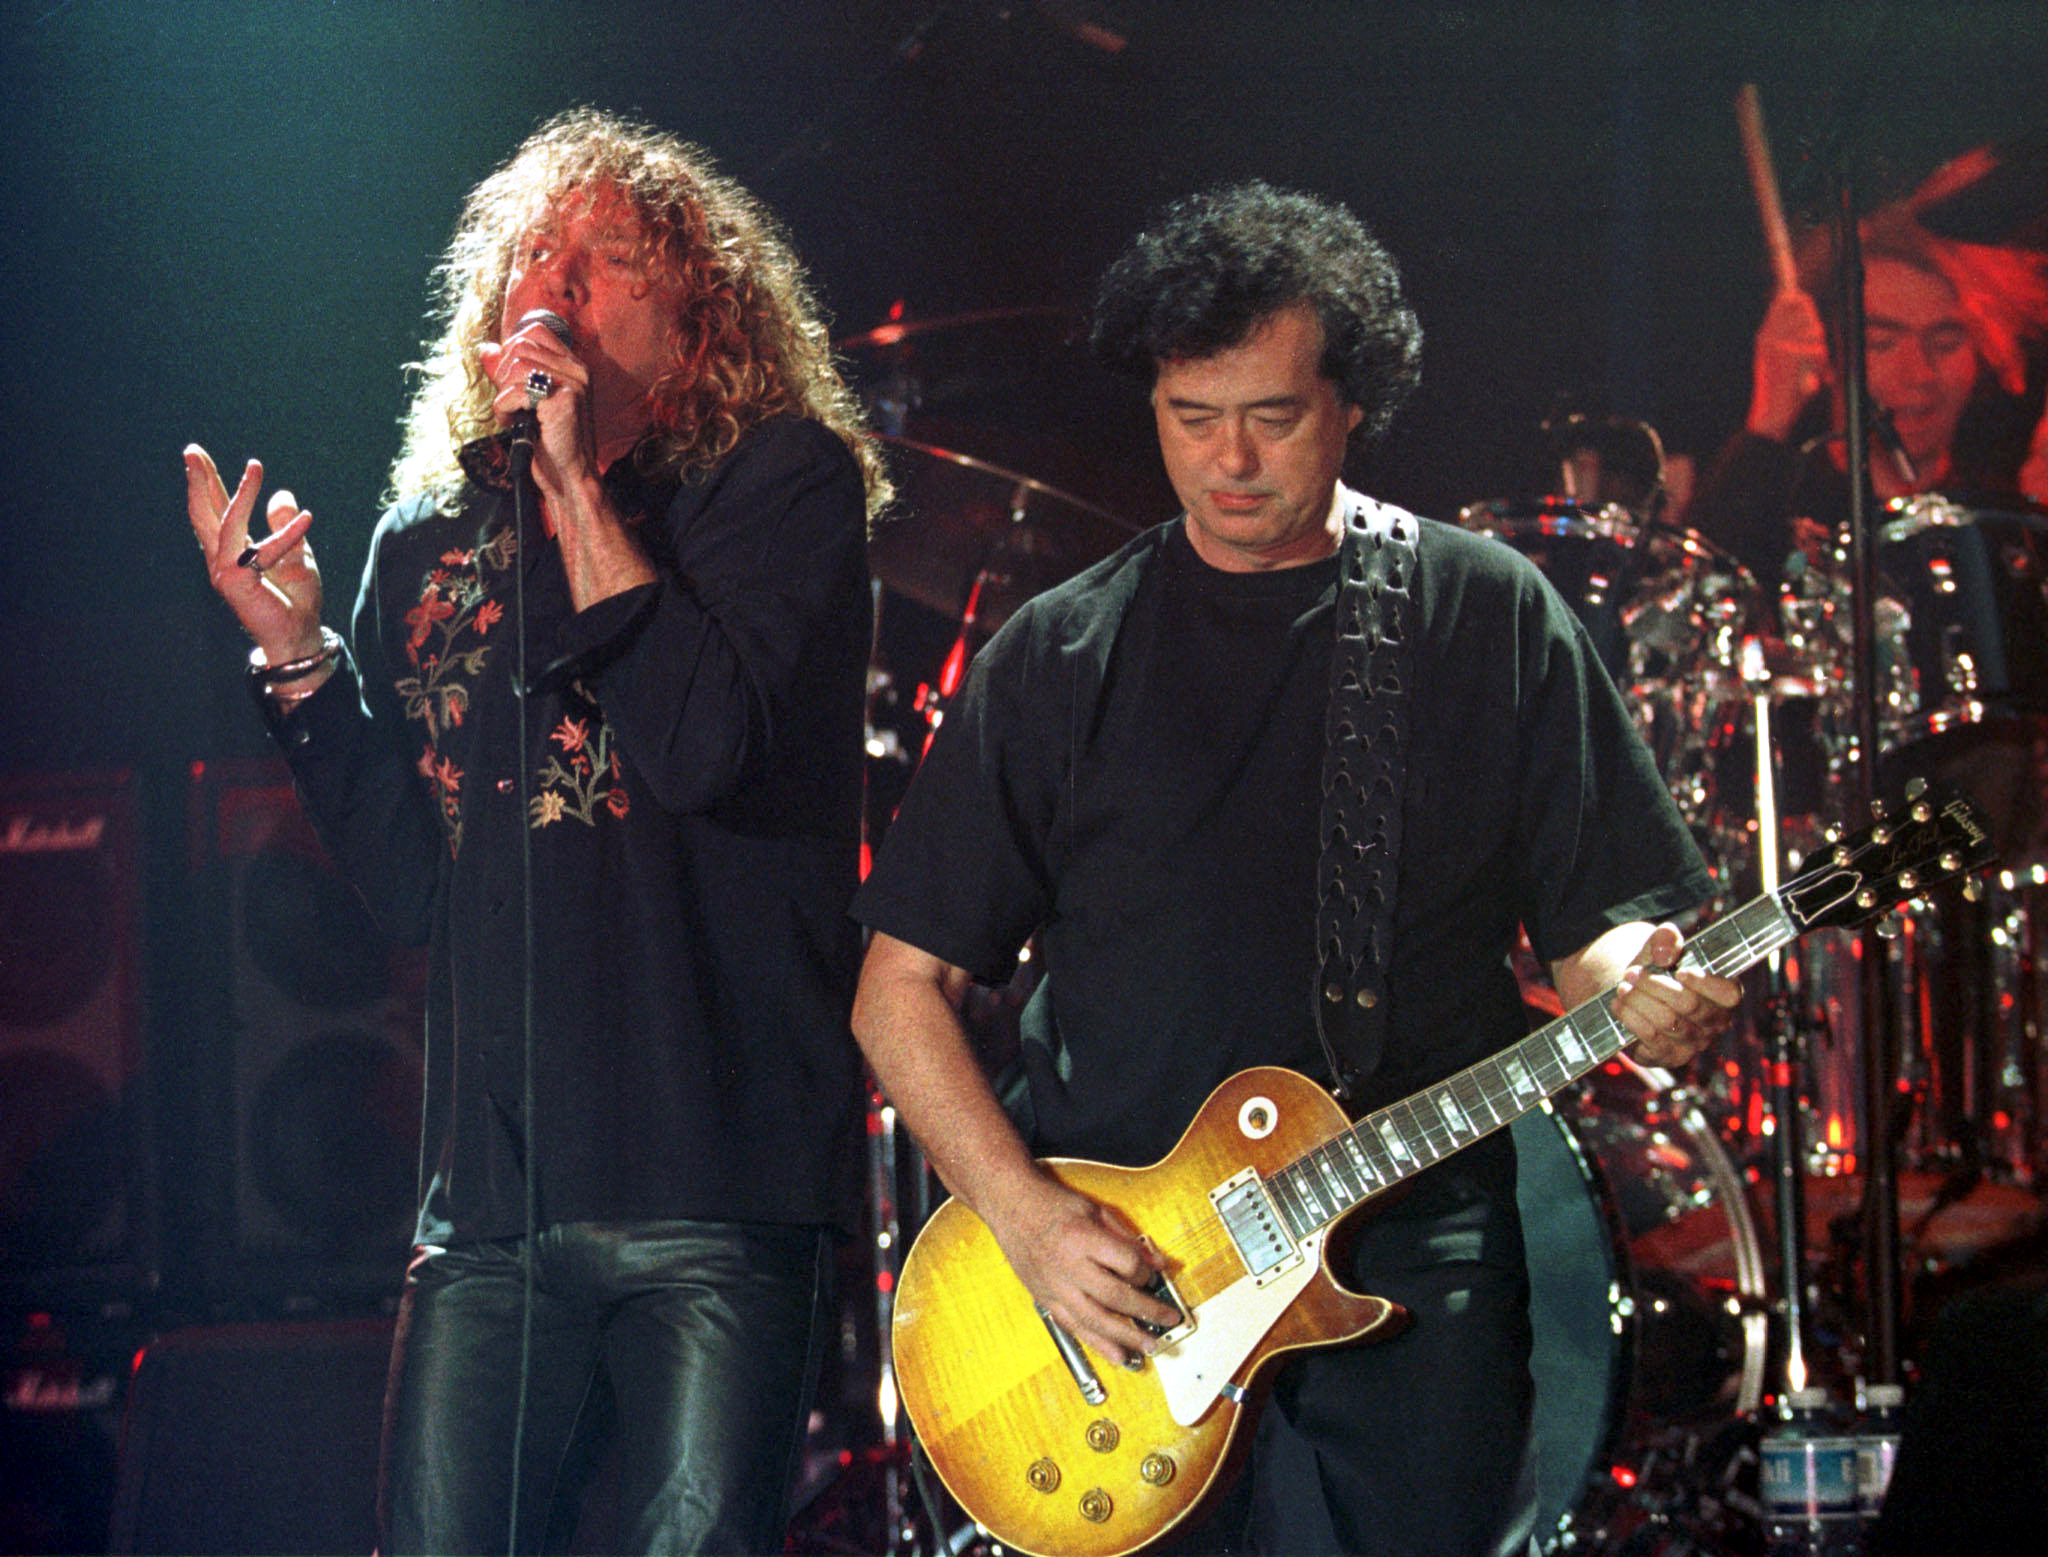 2011 Robert Plant Show